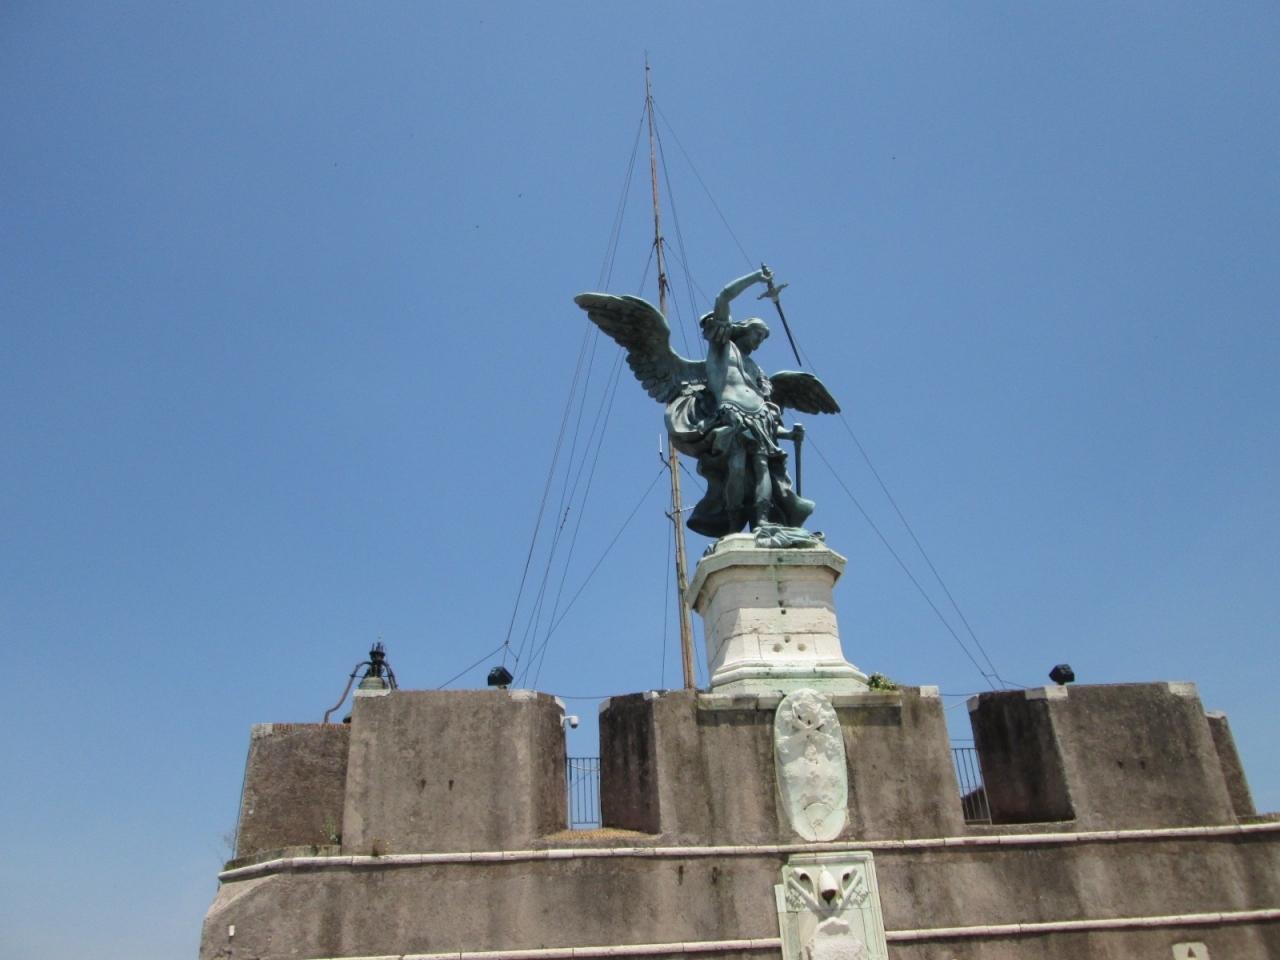 2013 Secondo viaggio a Roma #3 Castel Sant'Angelo サンタンジェロ城